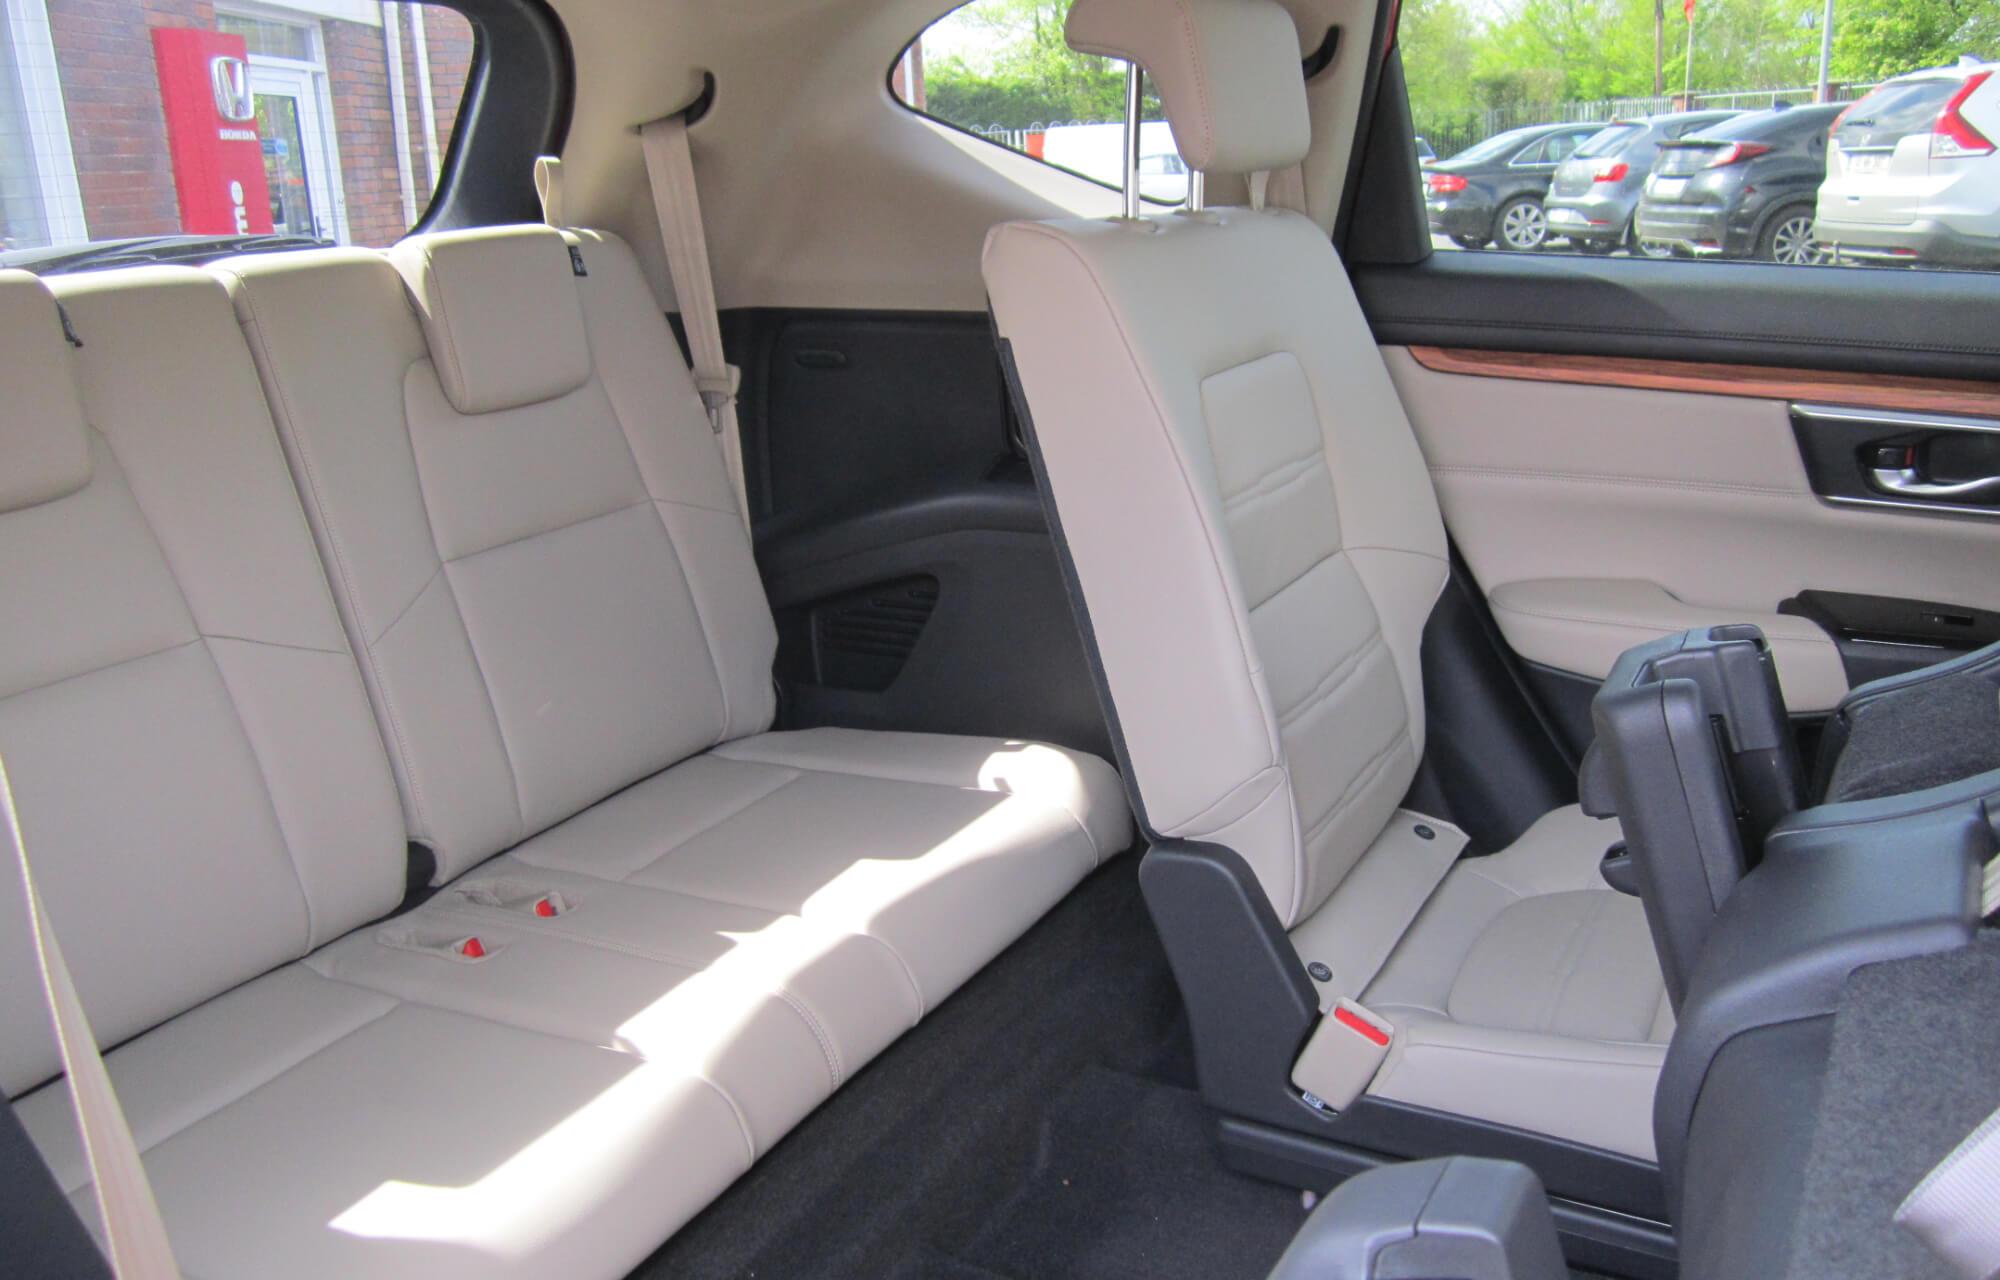 2019 CR-V 1.5 i-VTEC Elegance 7-Seater AWD now available at John Adams Car Sales